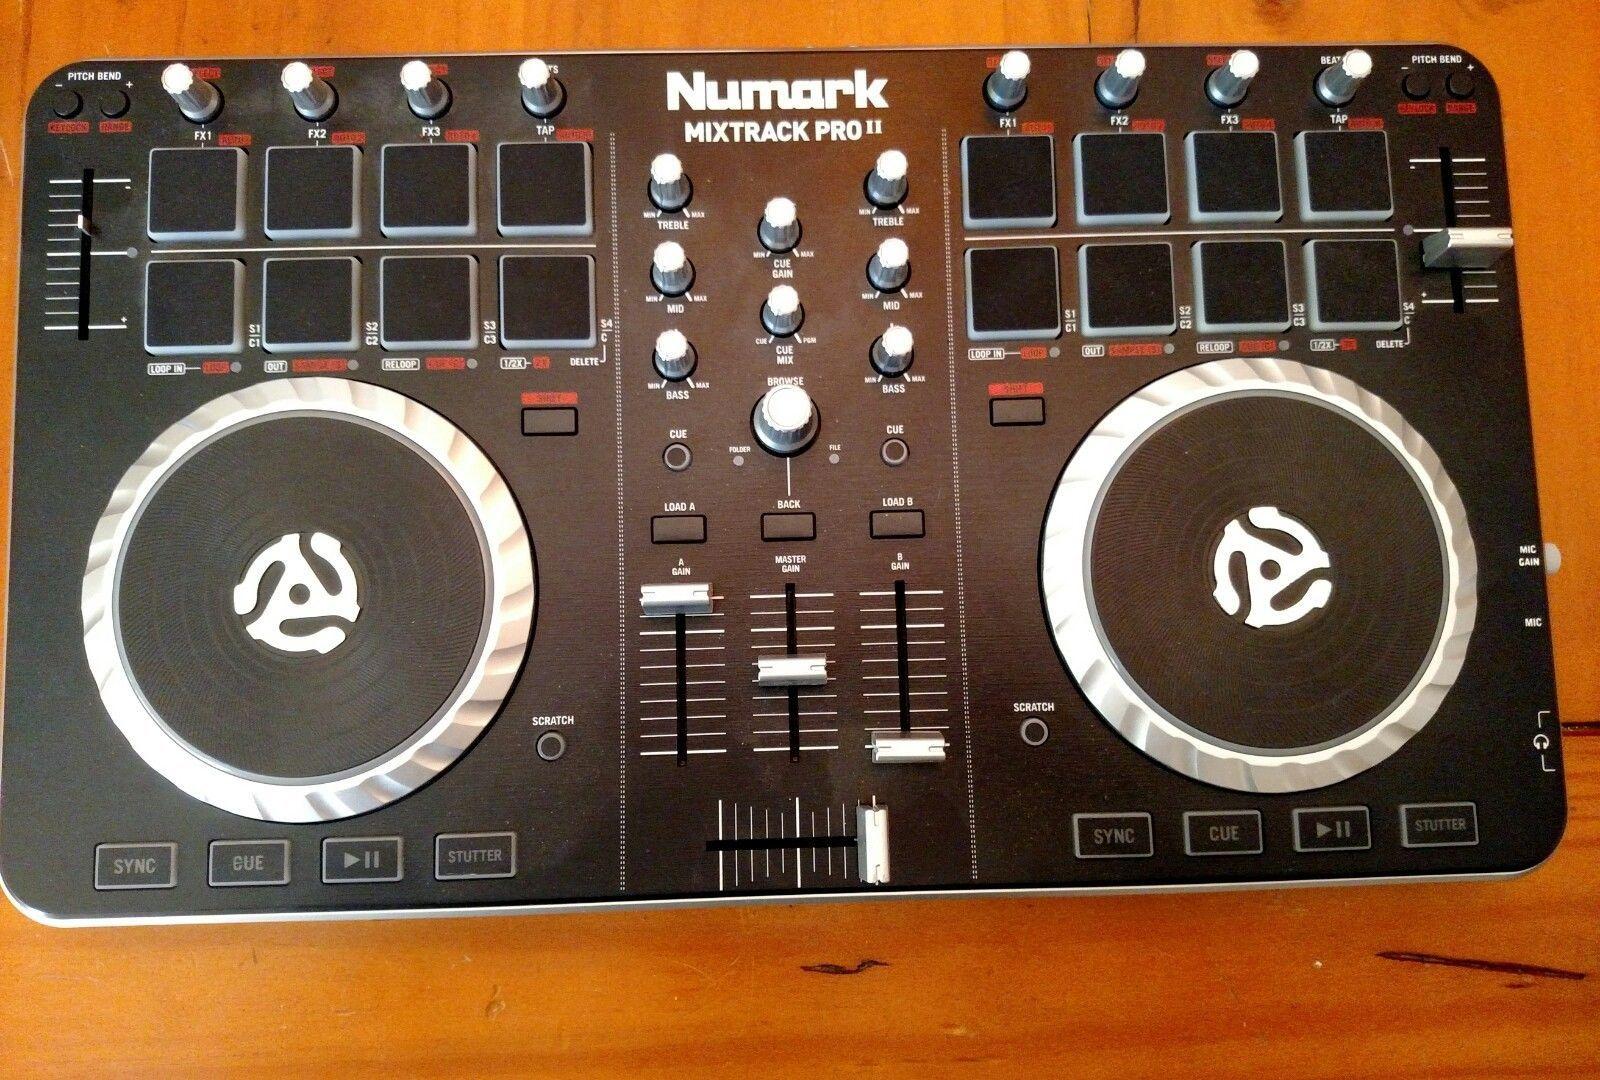 Numark Mixtrack Pro Ii Dj Controller With Audio I O on numark mixtrack pro scratching, numark mixtrack vs mixtrack pro, numark mixtrack pro pitch bend, numark mixtrack pro software,